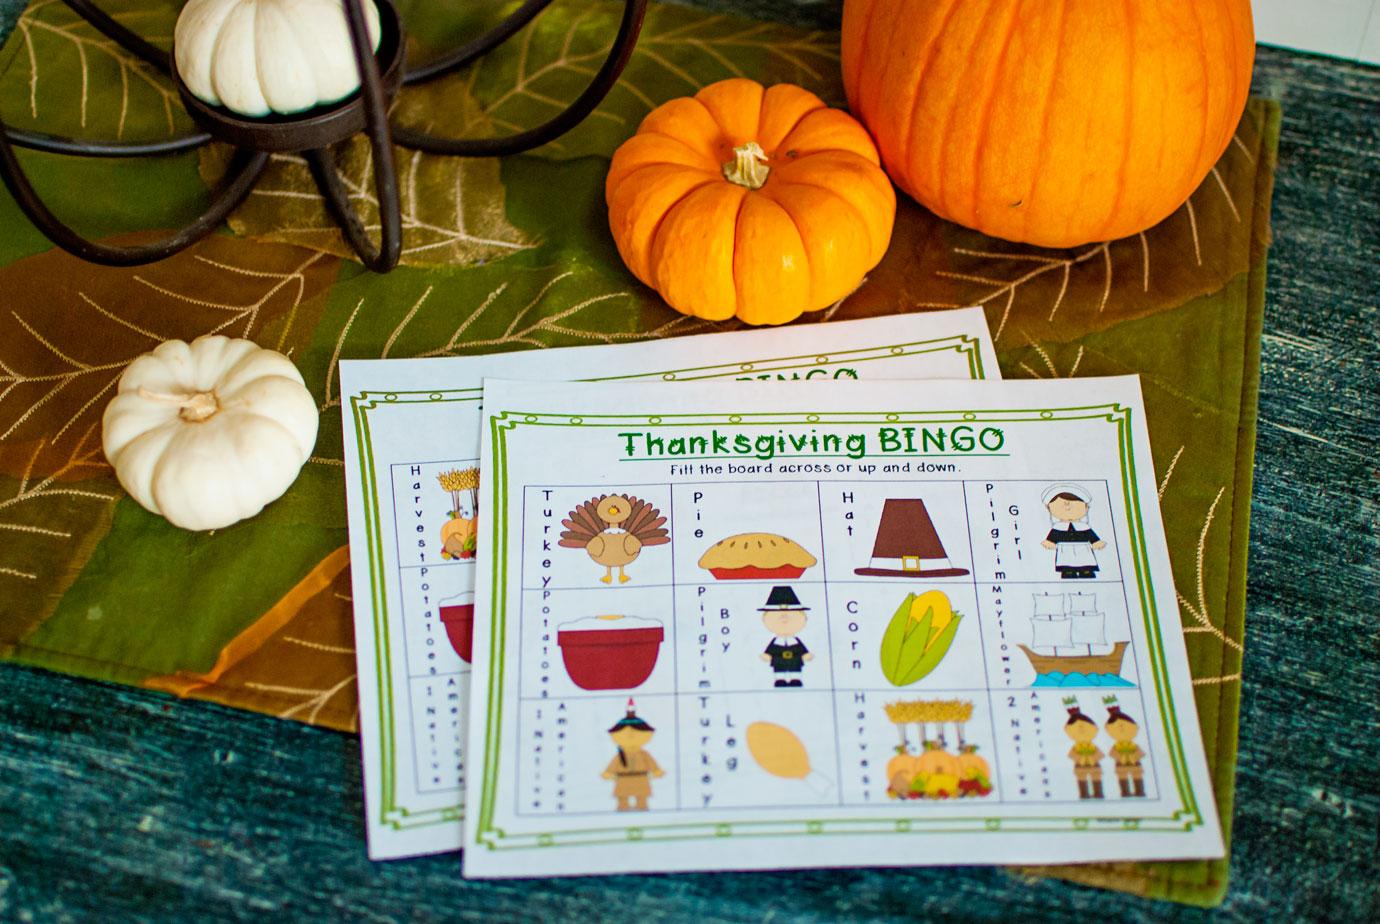 Kids Thanksgiving Bingo Game From TeacherSherpa